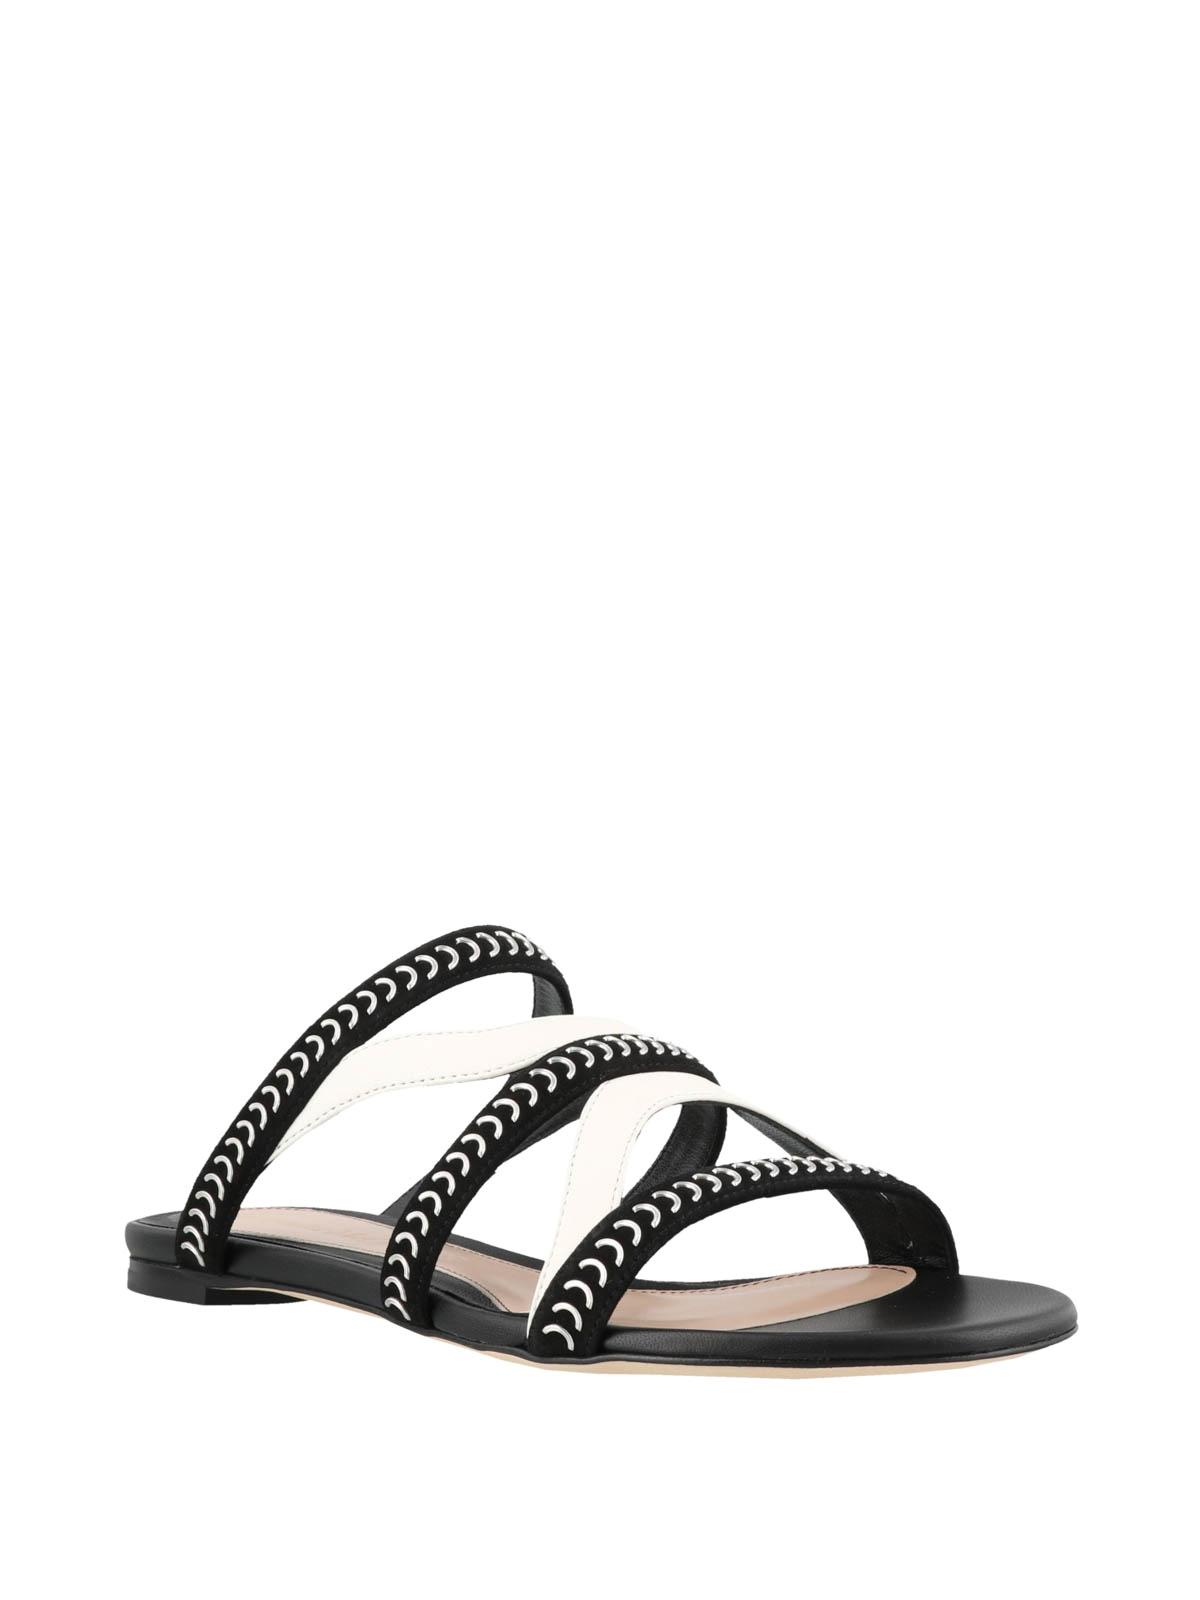 alexander mcqueen flat sandals